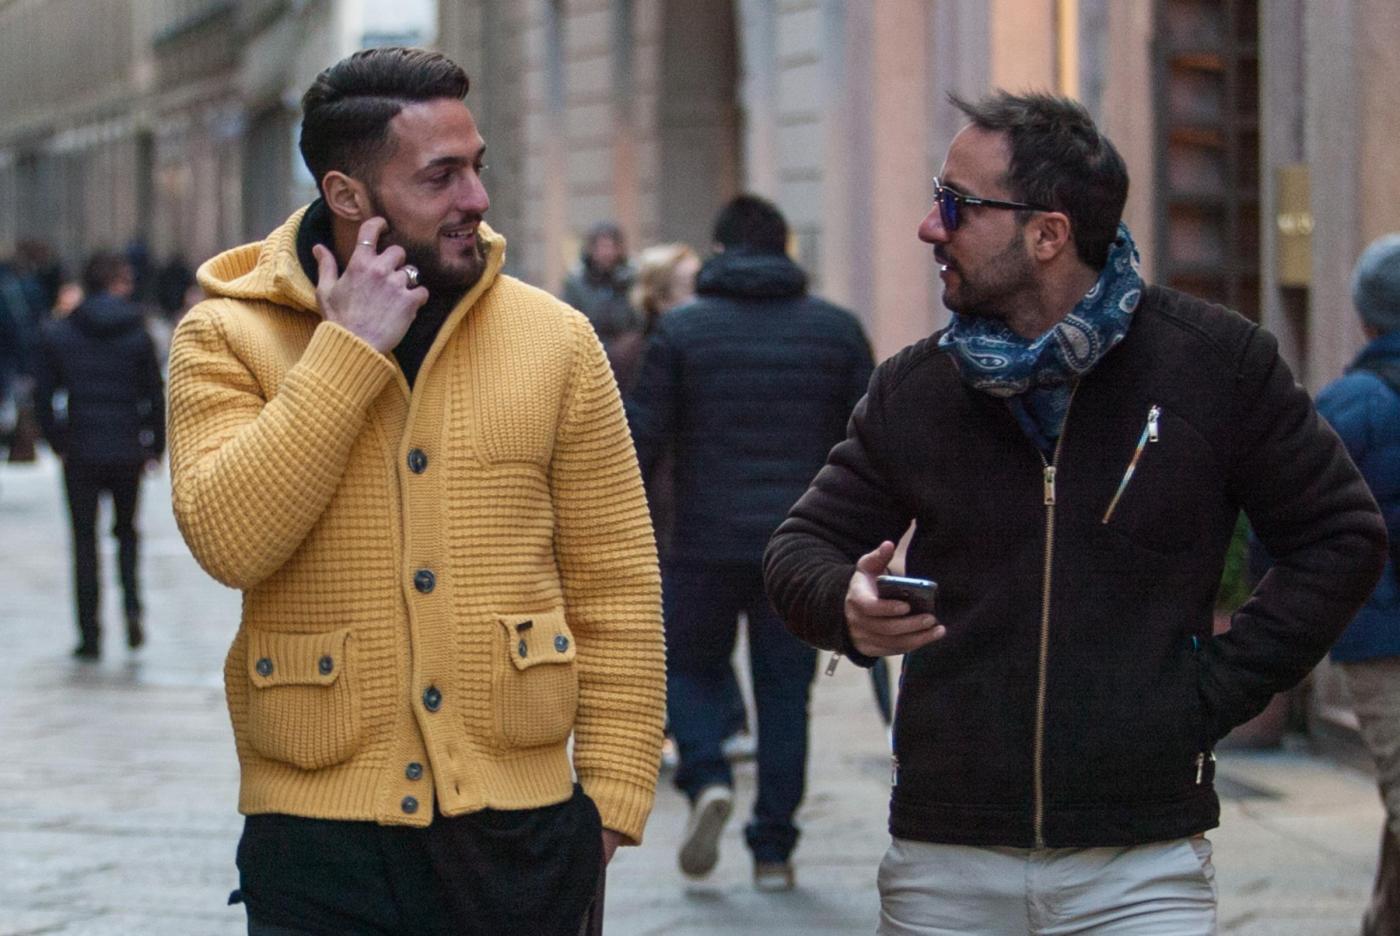 D'Ambrosio, Shaqiri, Samuel Eto'o: nello shopping Milano resta campione d'Italia02